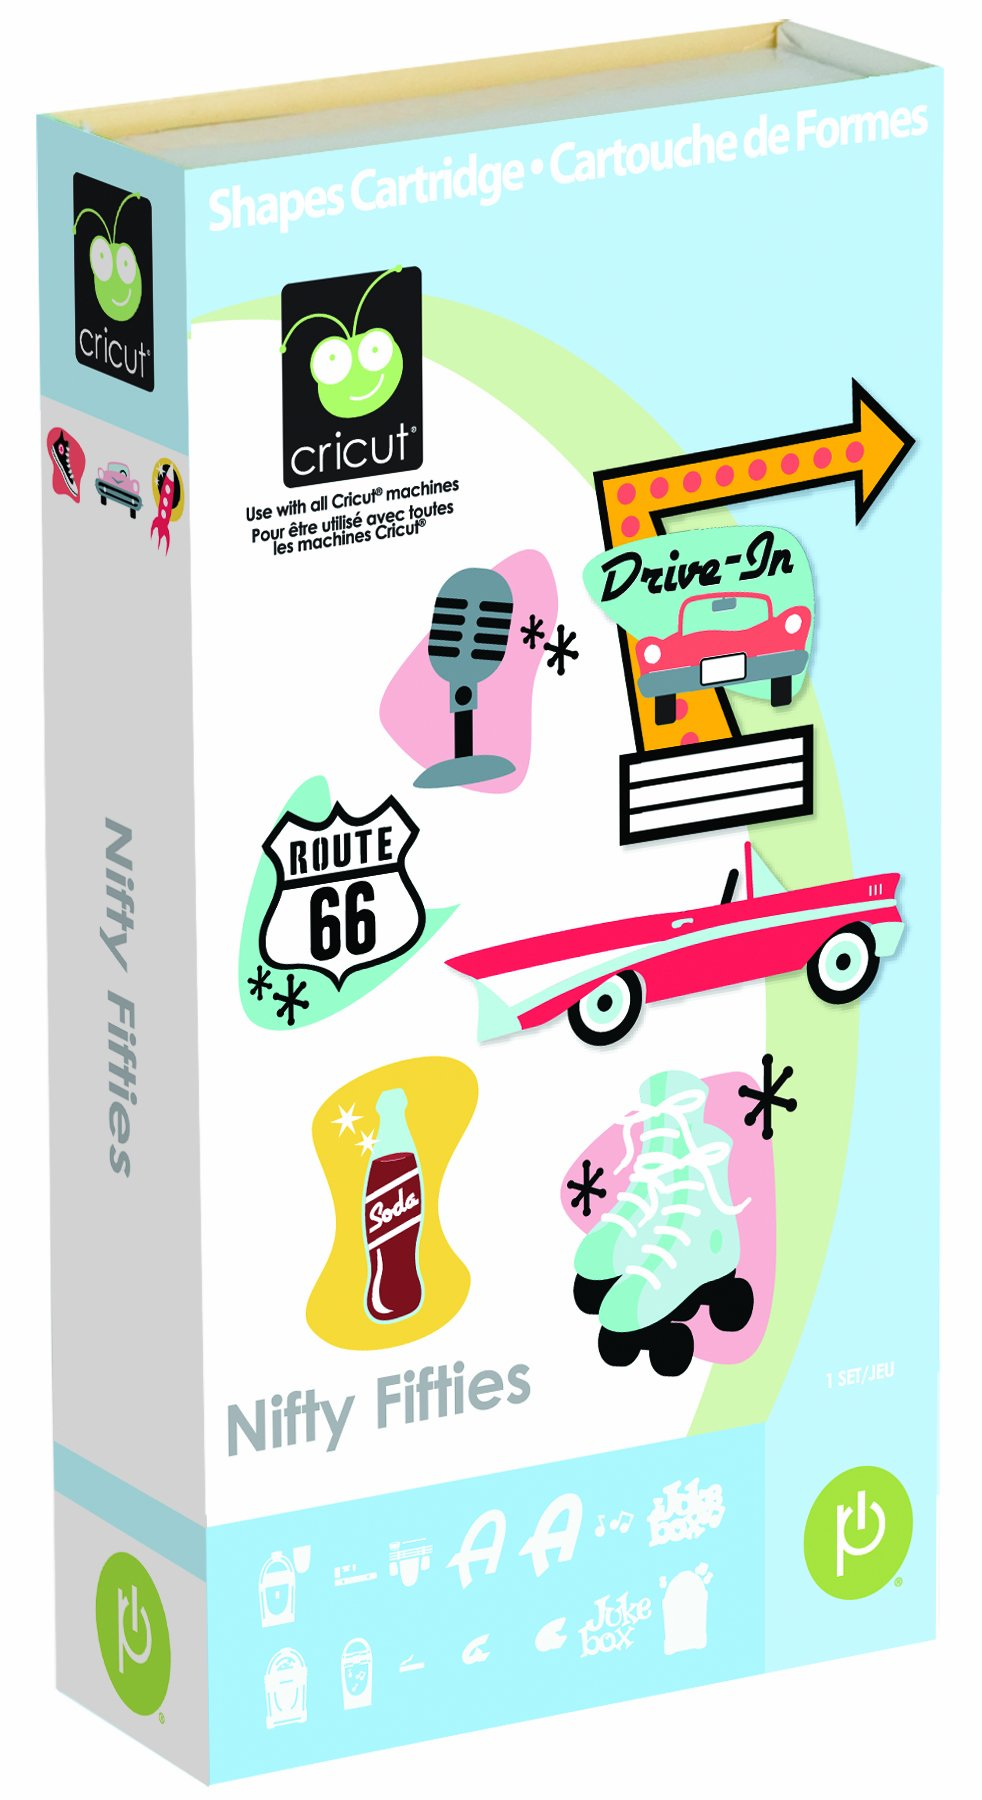 Provo Craft & Novelty Cricut Cartridge Nifty Fifties